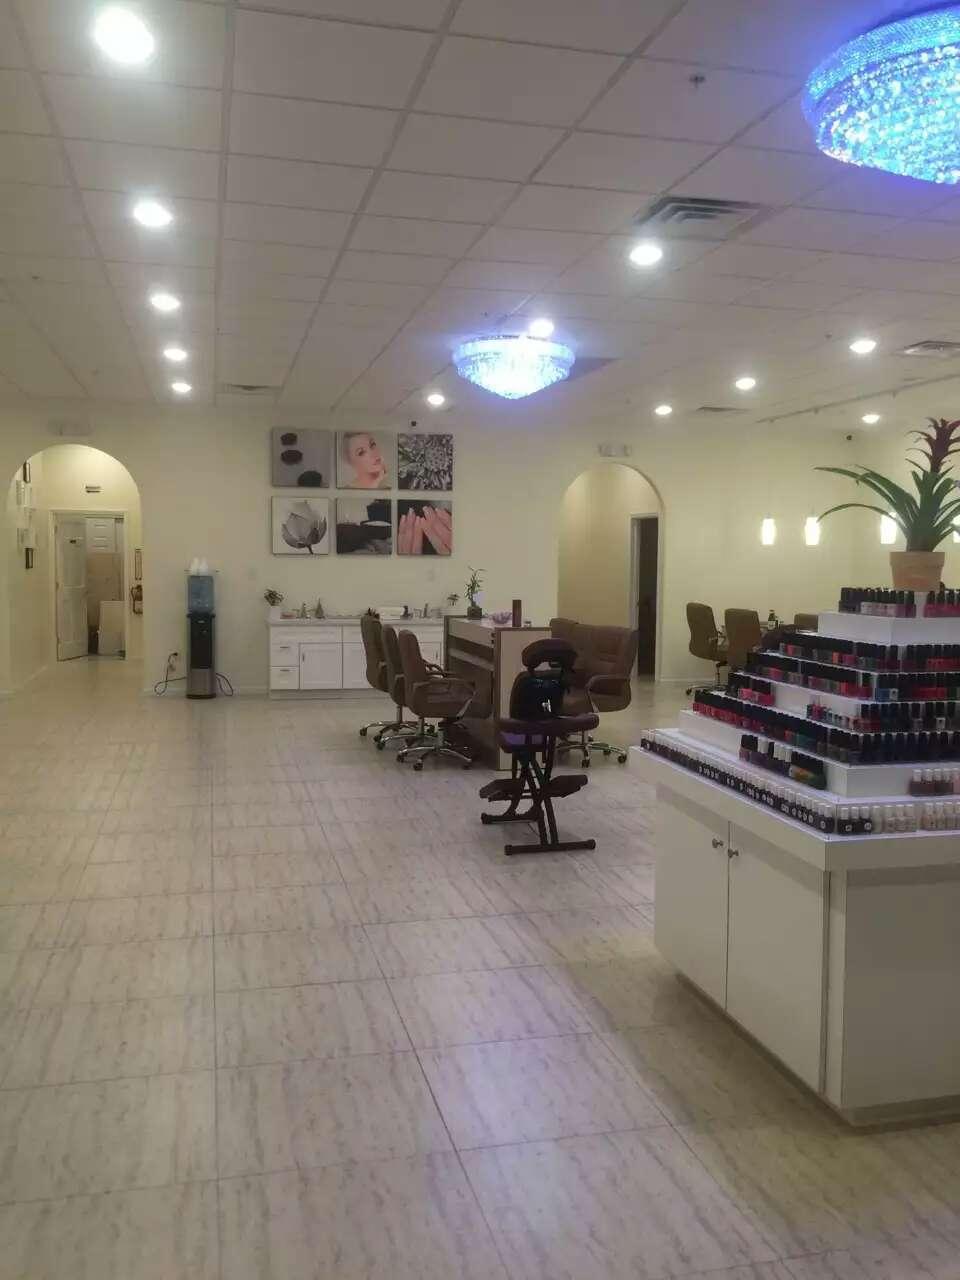 Royal Beauty Nails and Spa - hair care    Photo 3 of 9   Address: 1911, 461 US-46, Fairfield, NJ 07004, USA   Phone: (973) 227-1113